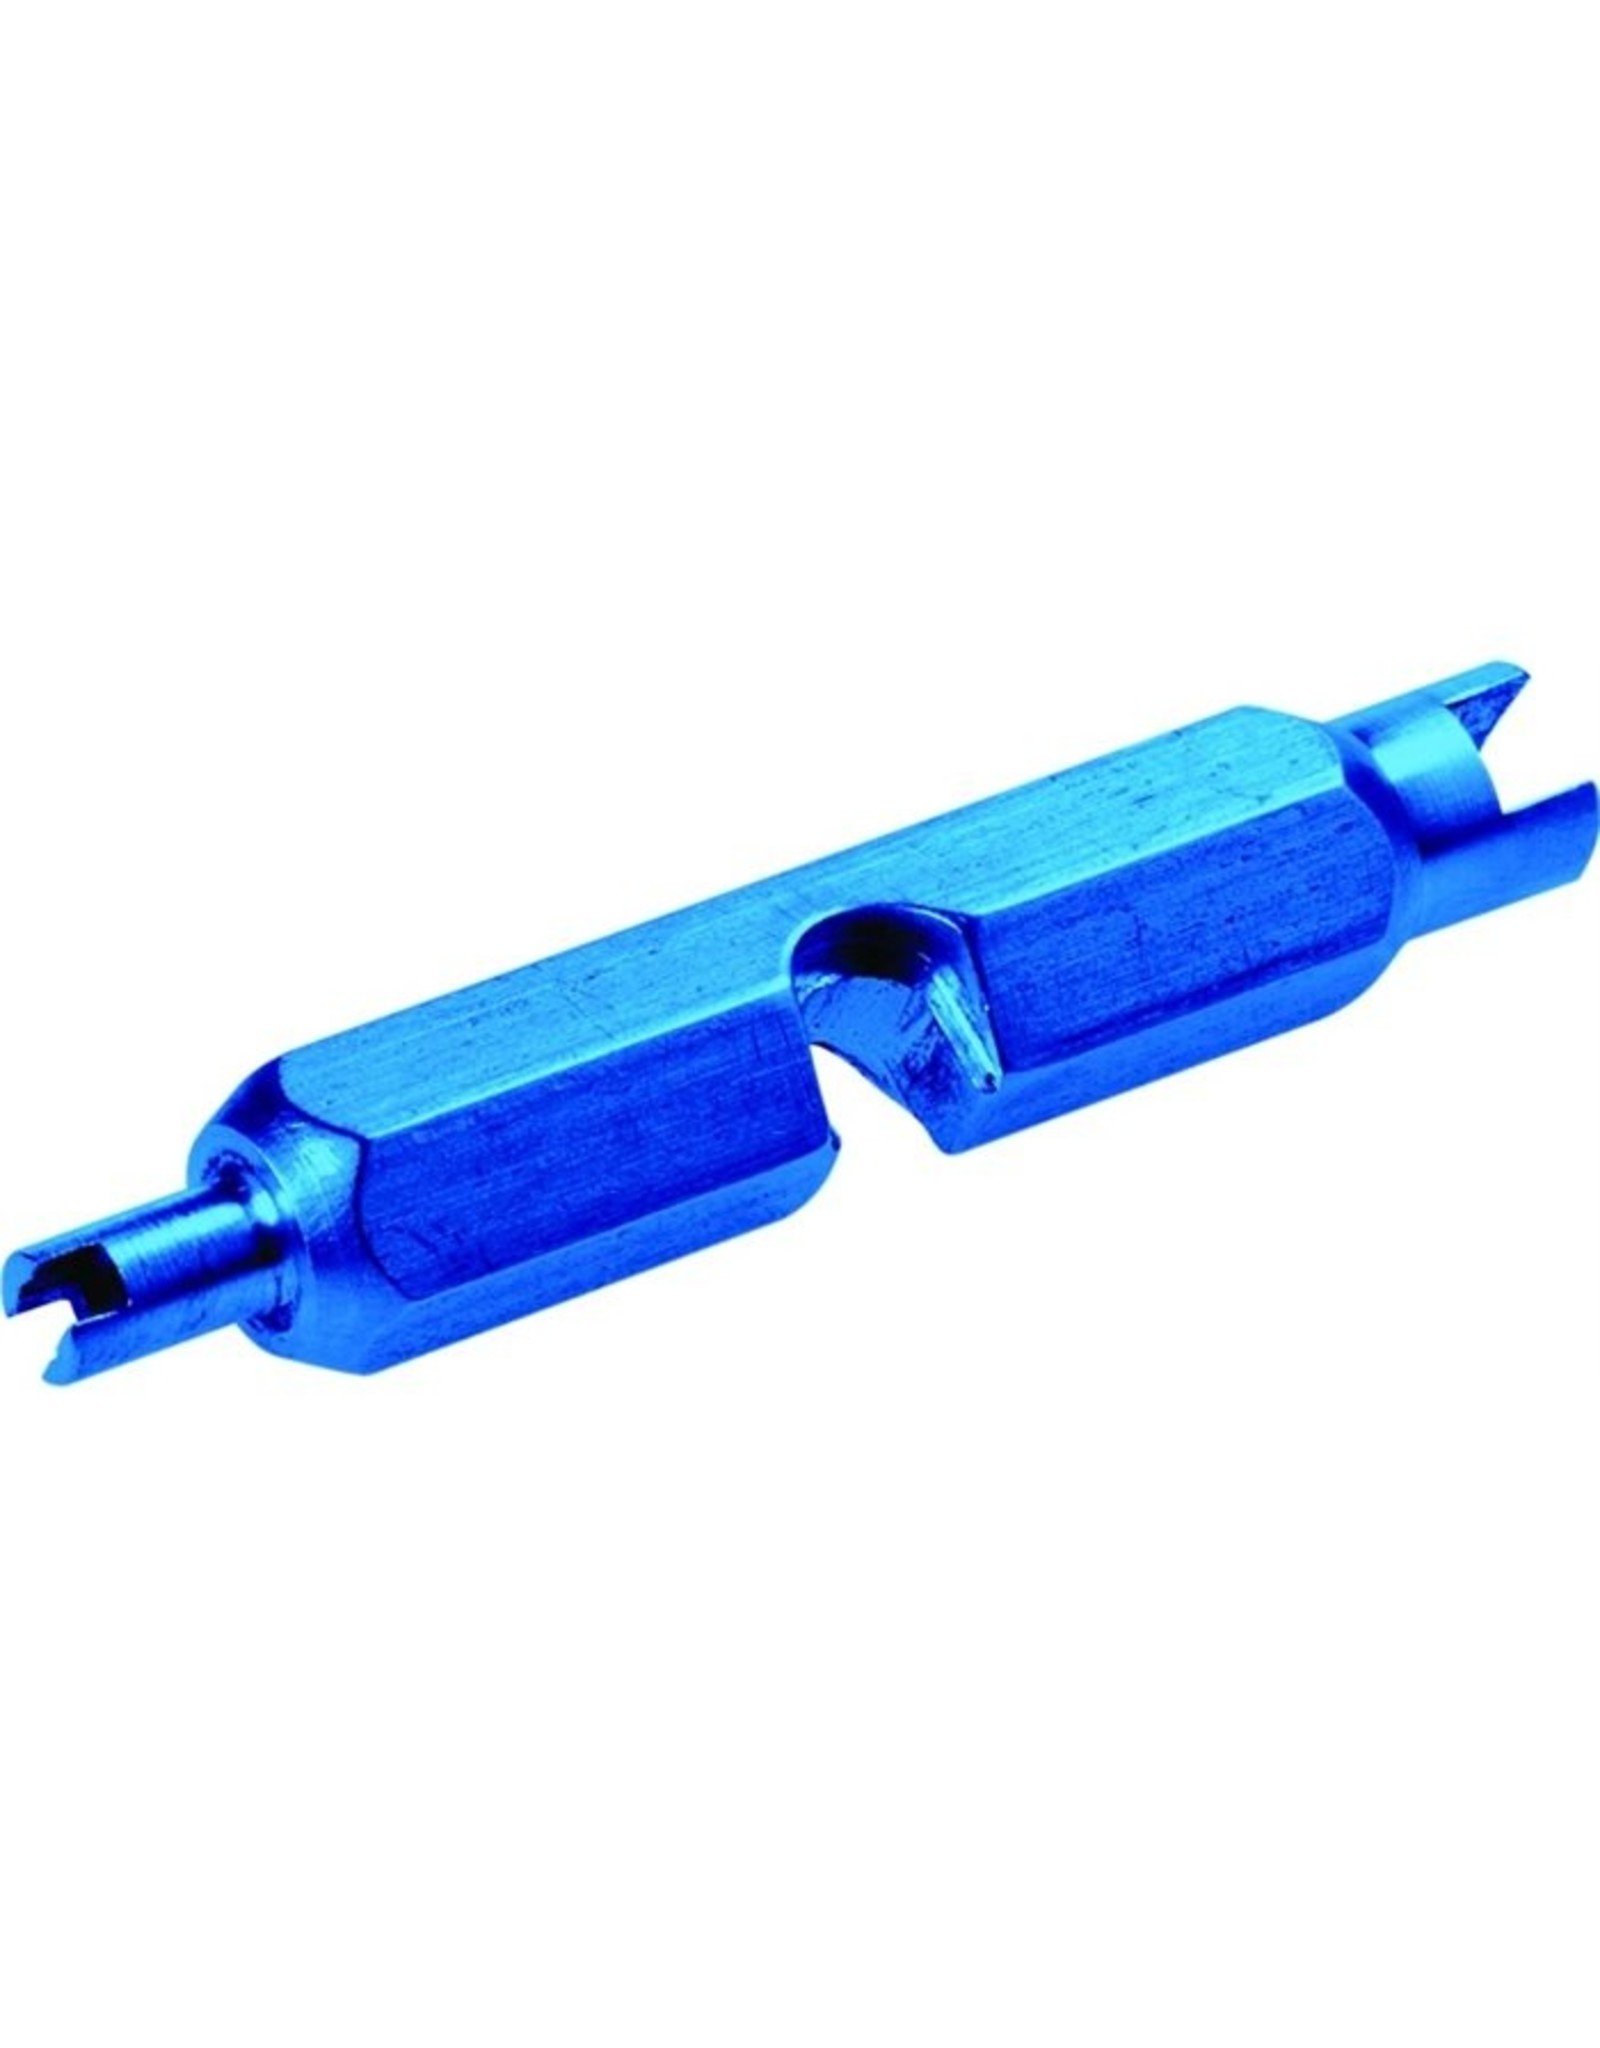 ParkTool VC-1 valve core tools